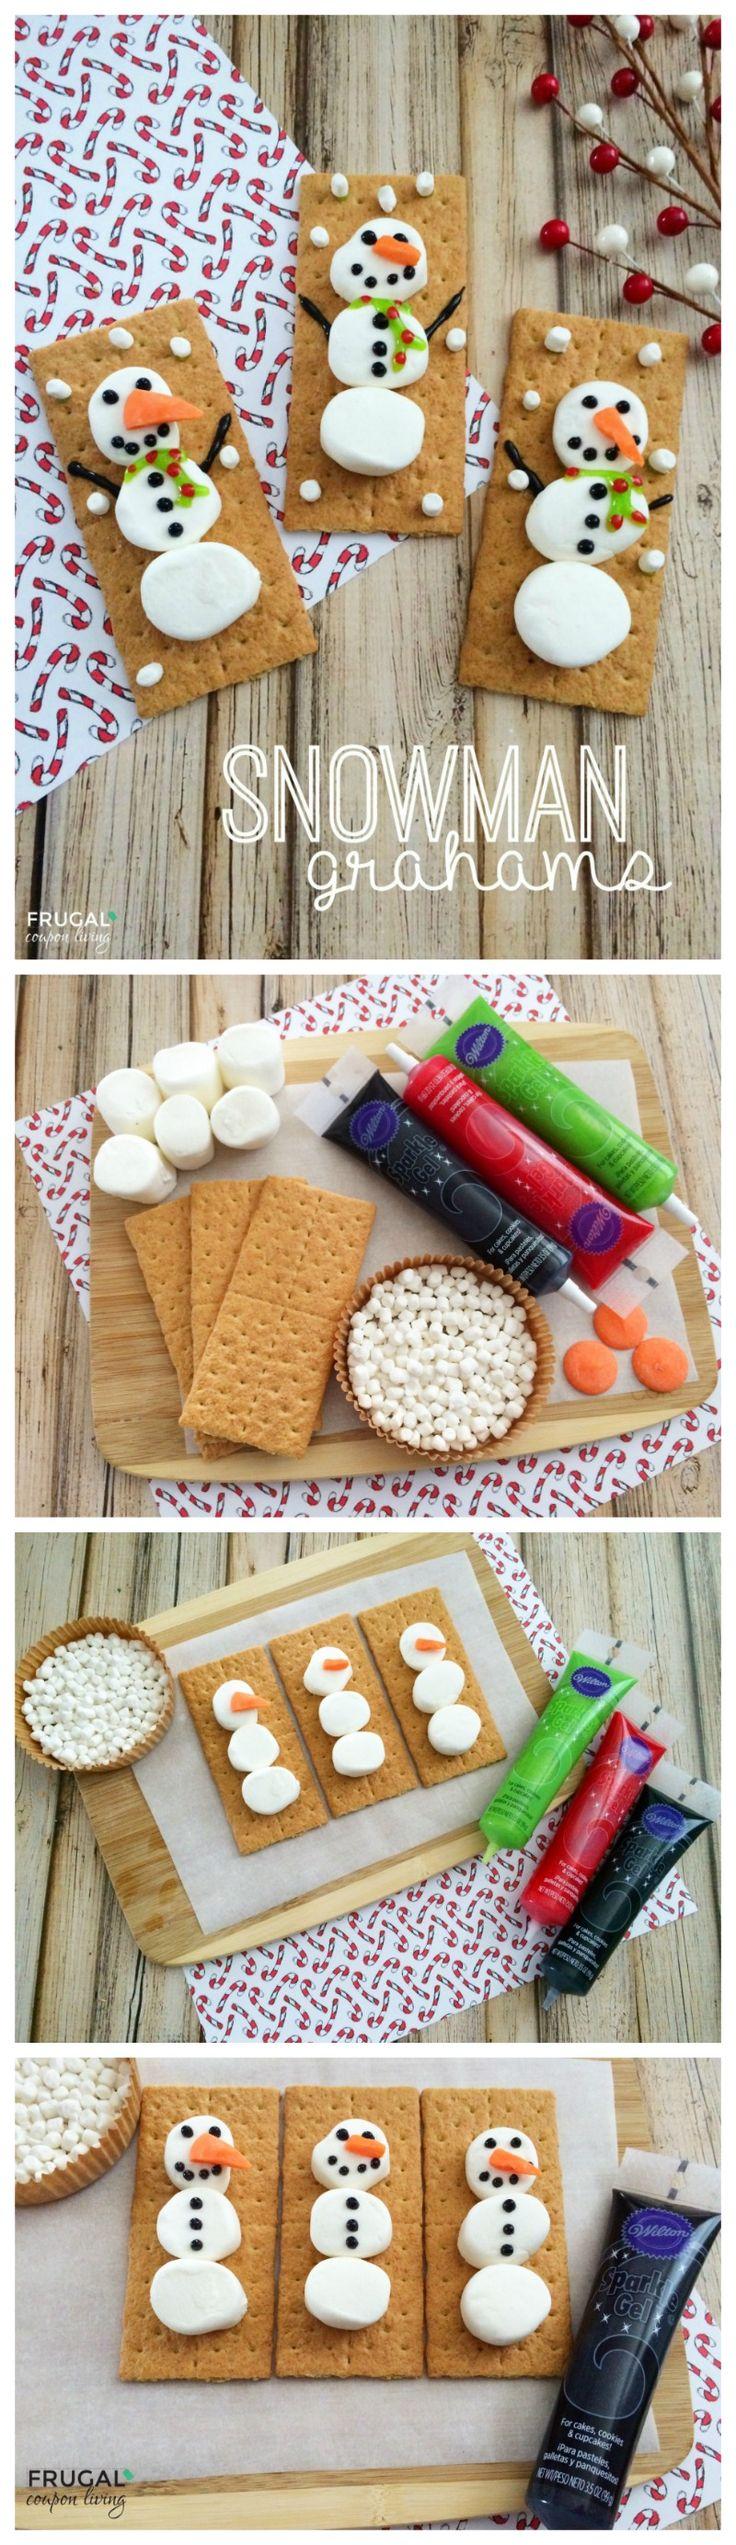 Snowman Grahams – Holiday Kids Food Craft